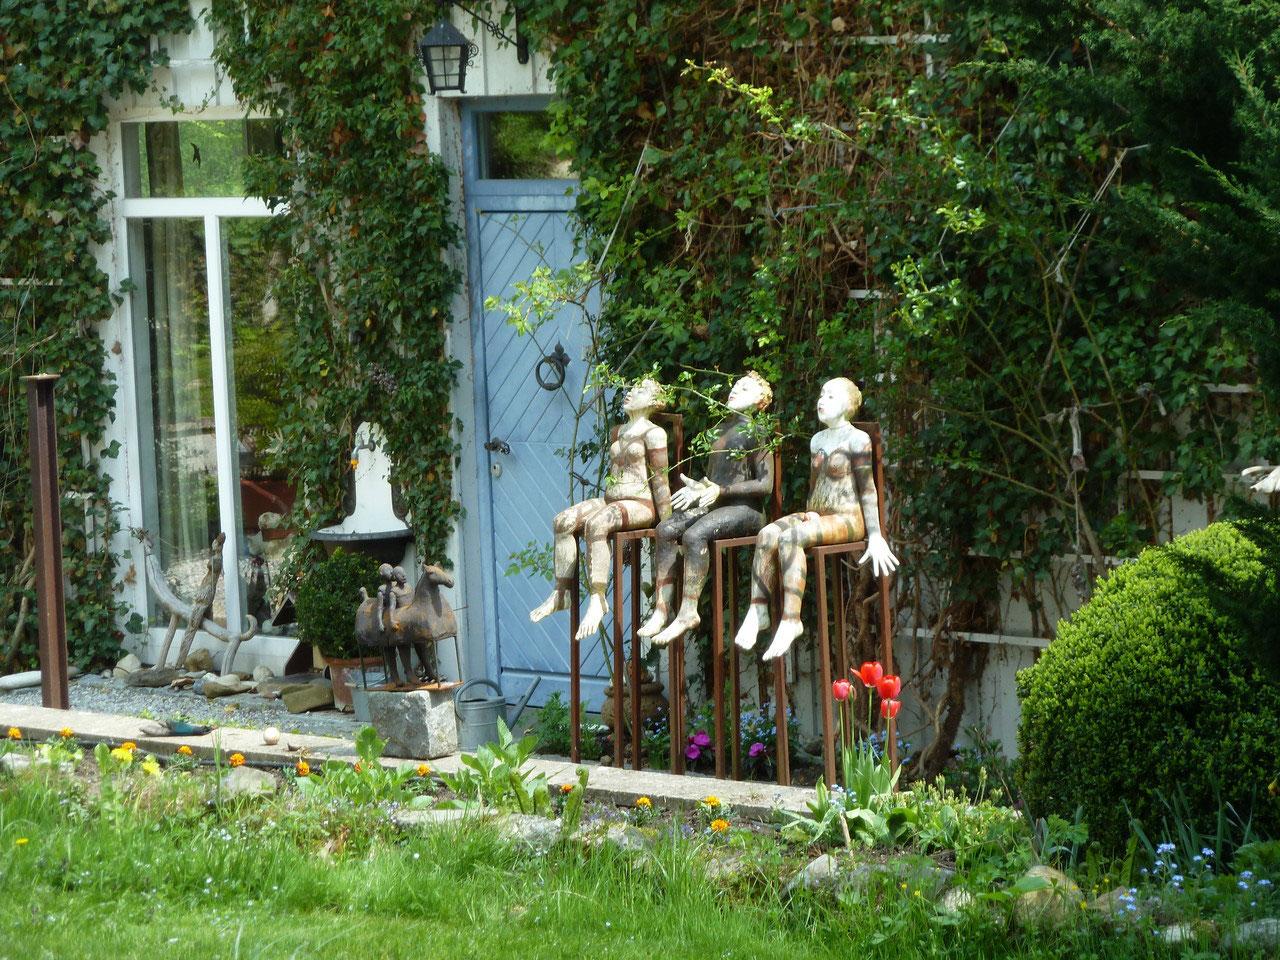 Full Size of Skulpturen Garten Gartenskulpturen Buddha Stein Edelstahl Aus Modern Selber Machen Italien Keramik Diewaldesde Kunst Im Bewässerung Essgruppe Relaxliege Garten Skulpturen Garten